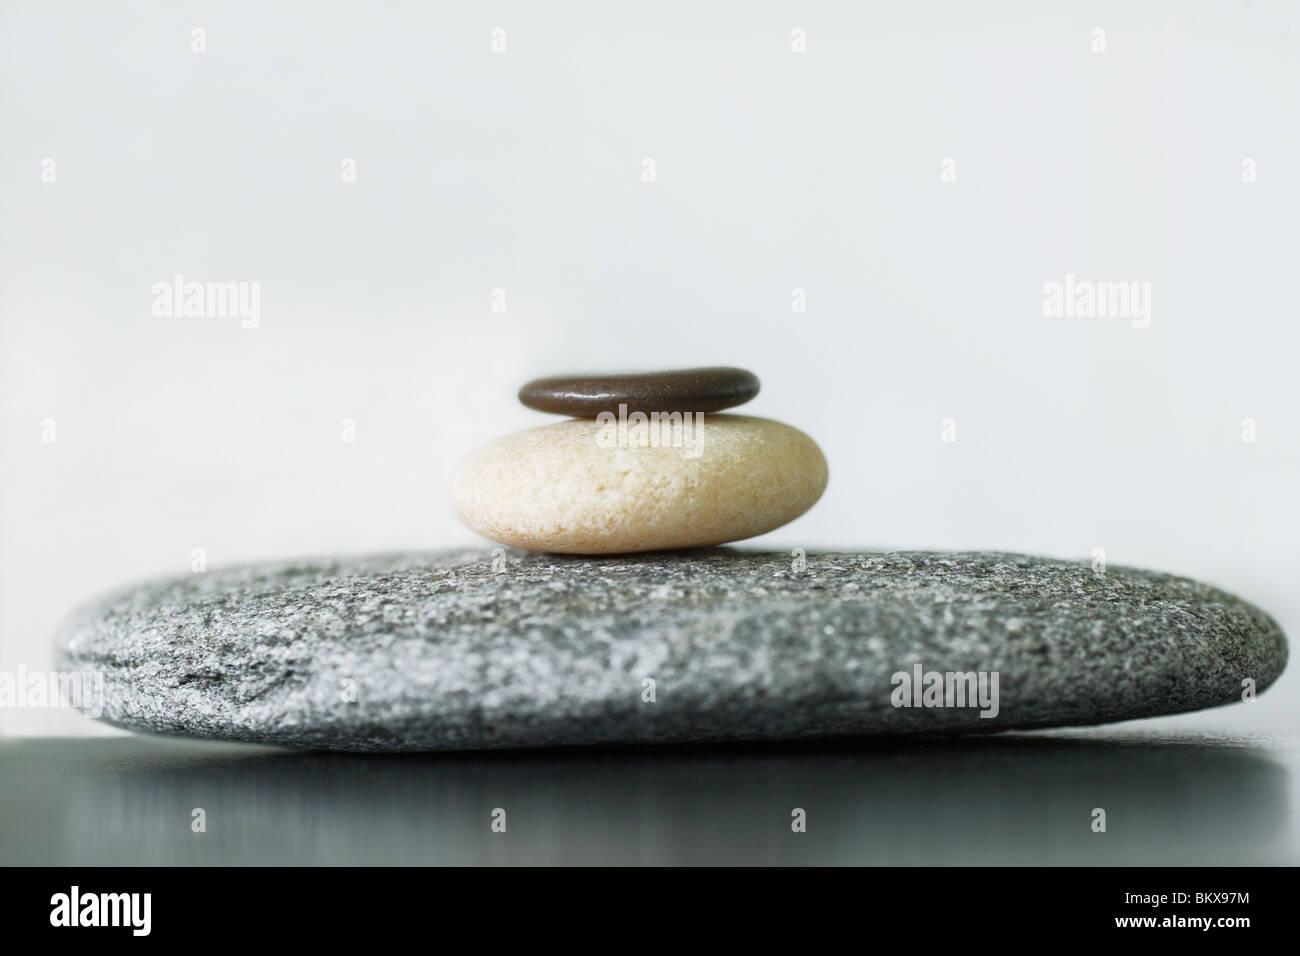 Stones balanced suggesting Zen, Calm and Serenity - Stock Image